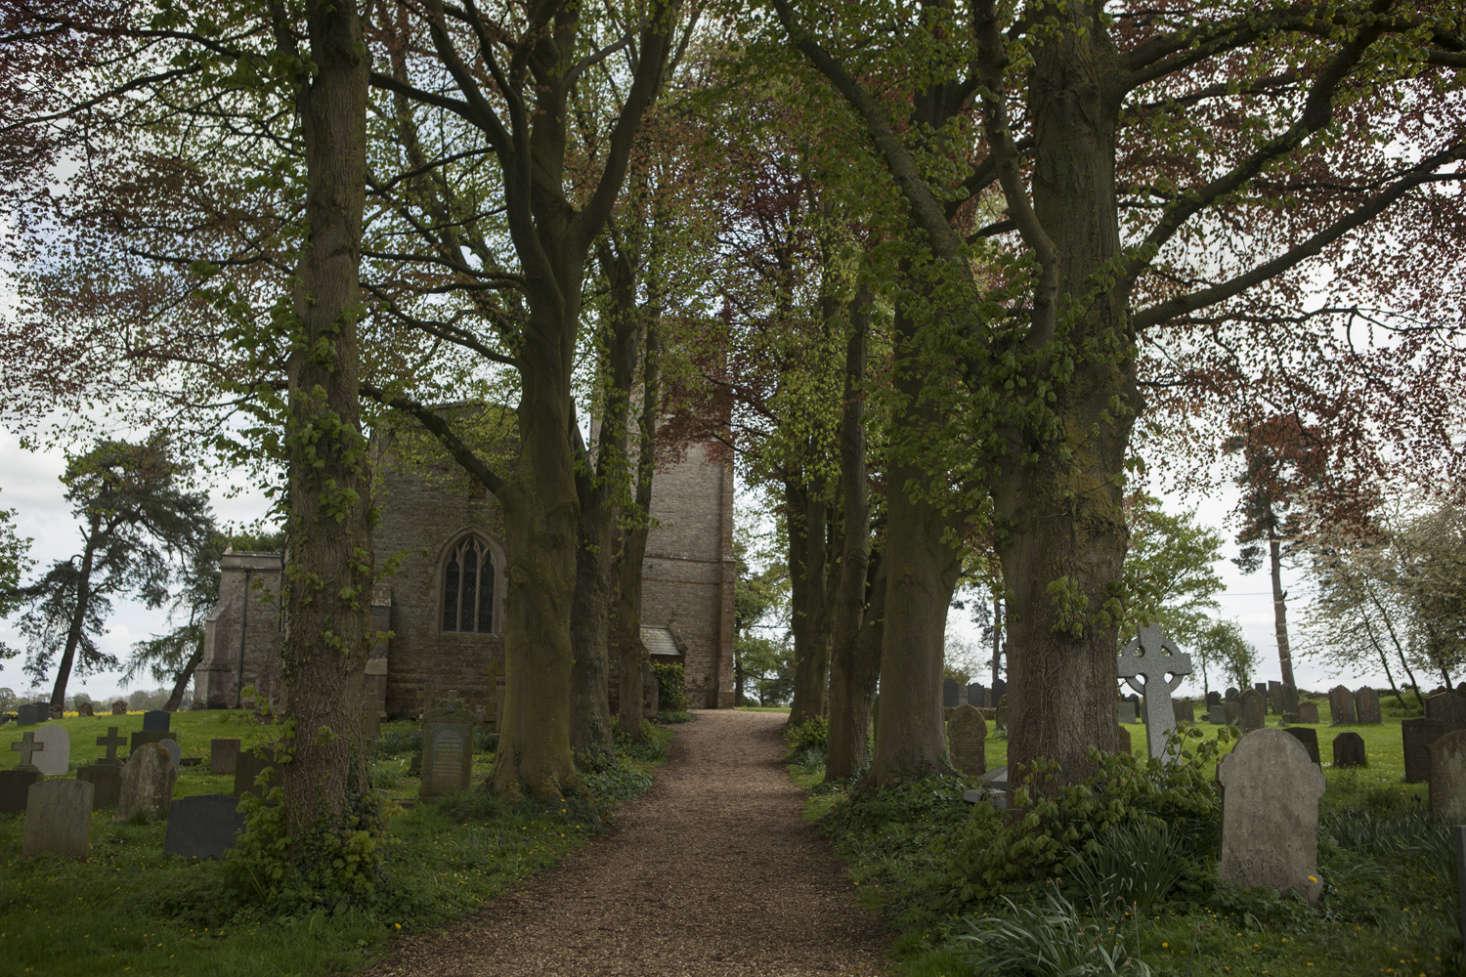 The Church of Saint Peter and Saint Paul at Harrington.